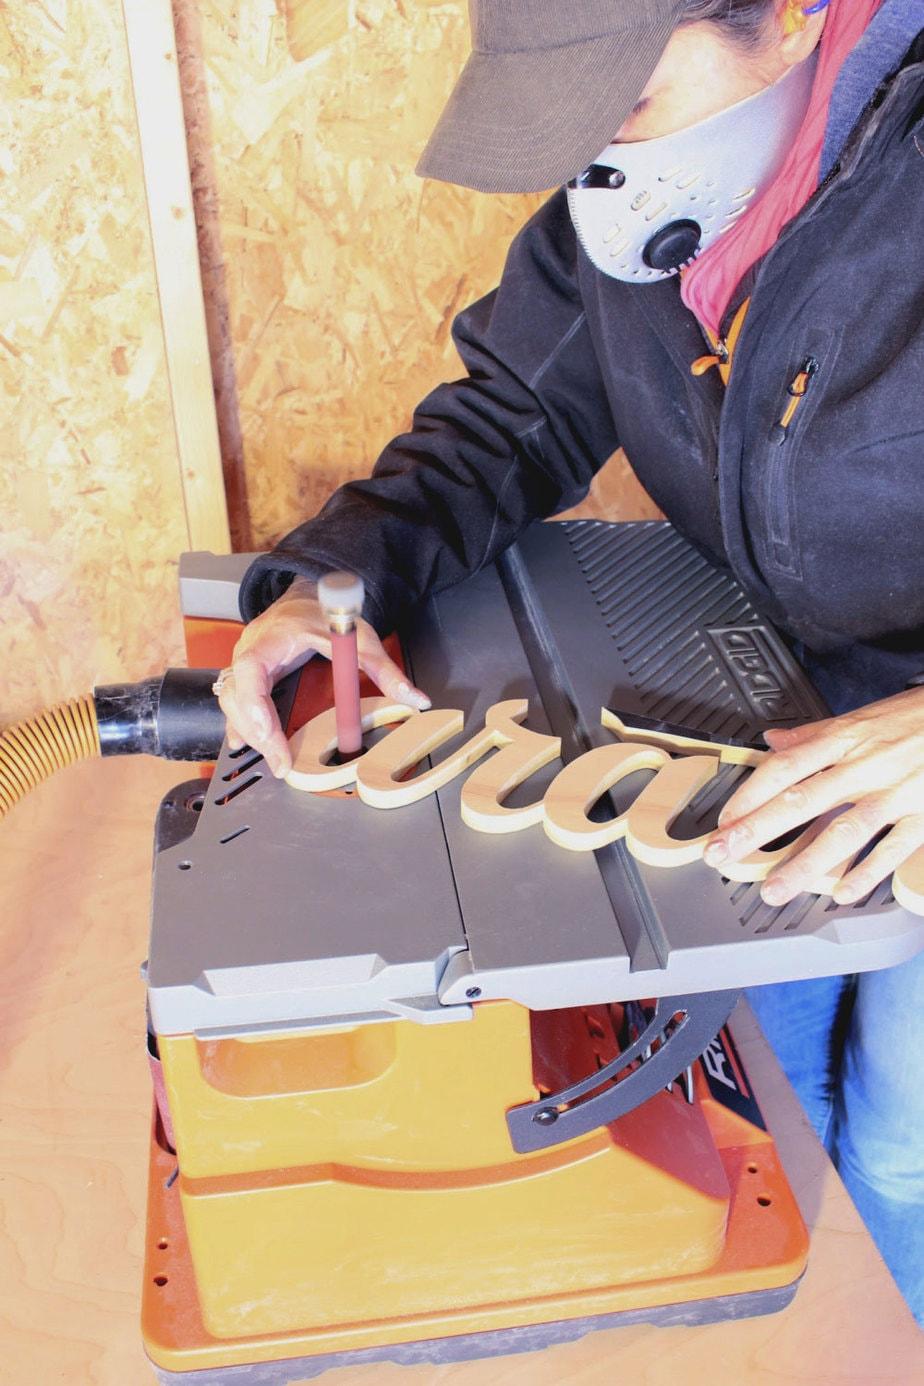 ridgid oscillating edge sander